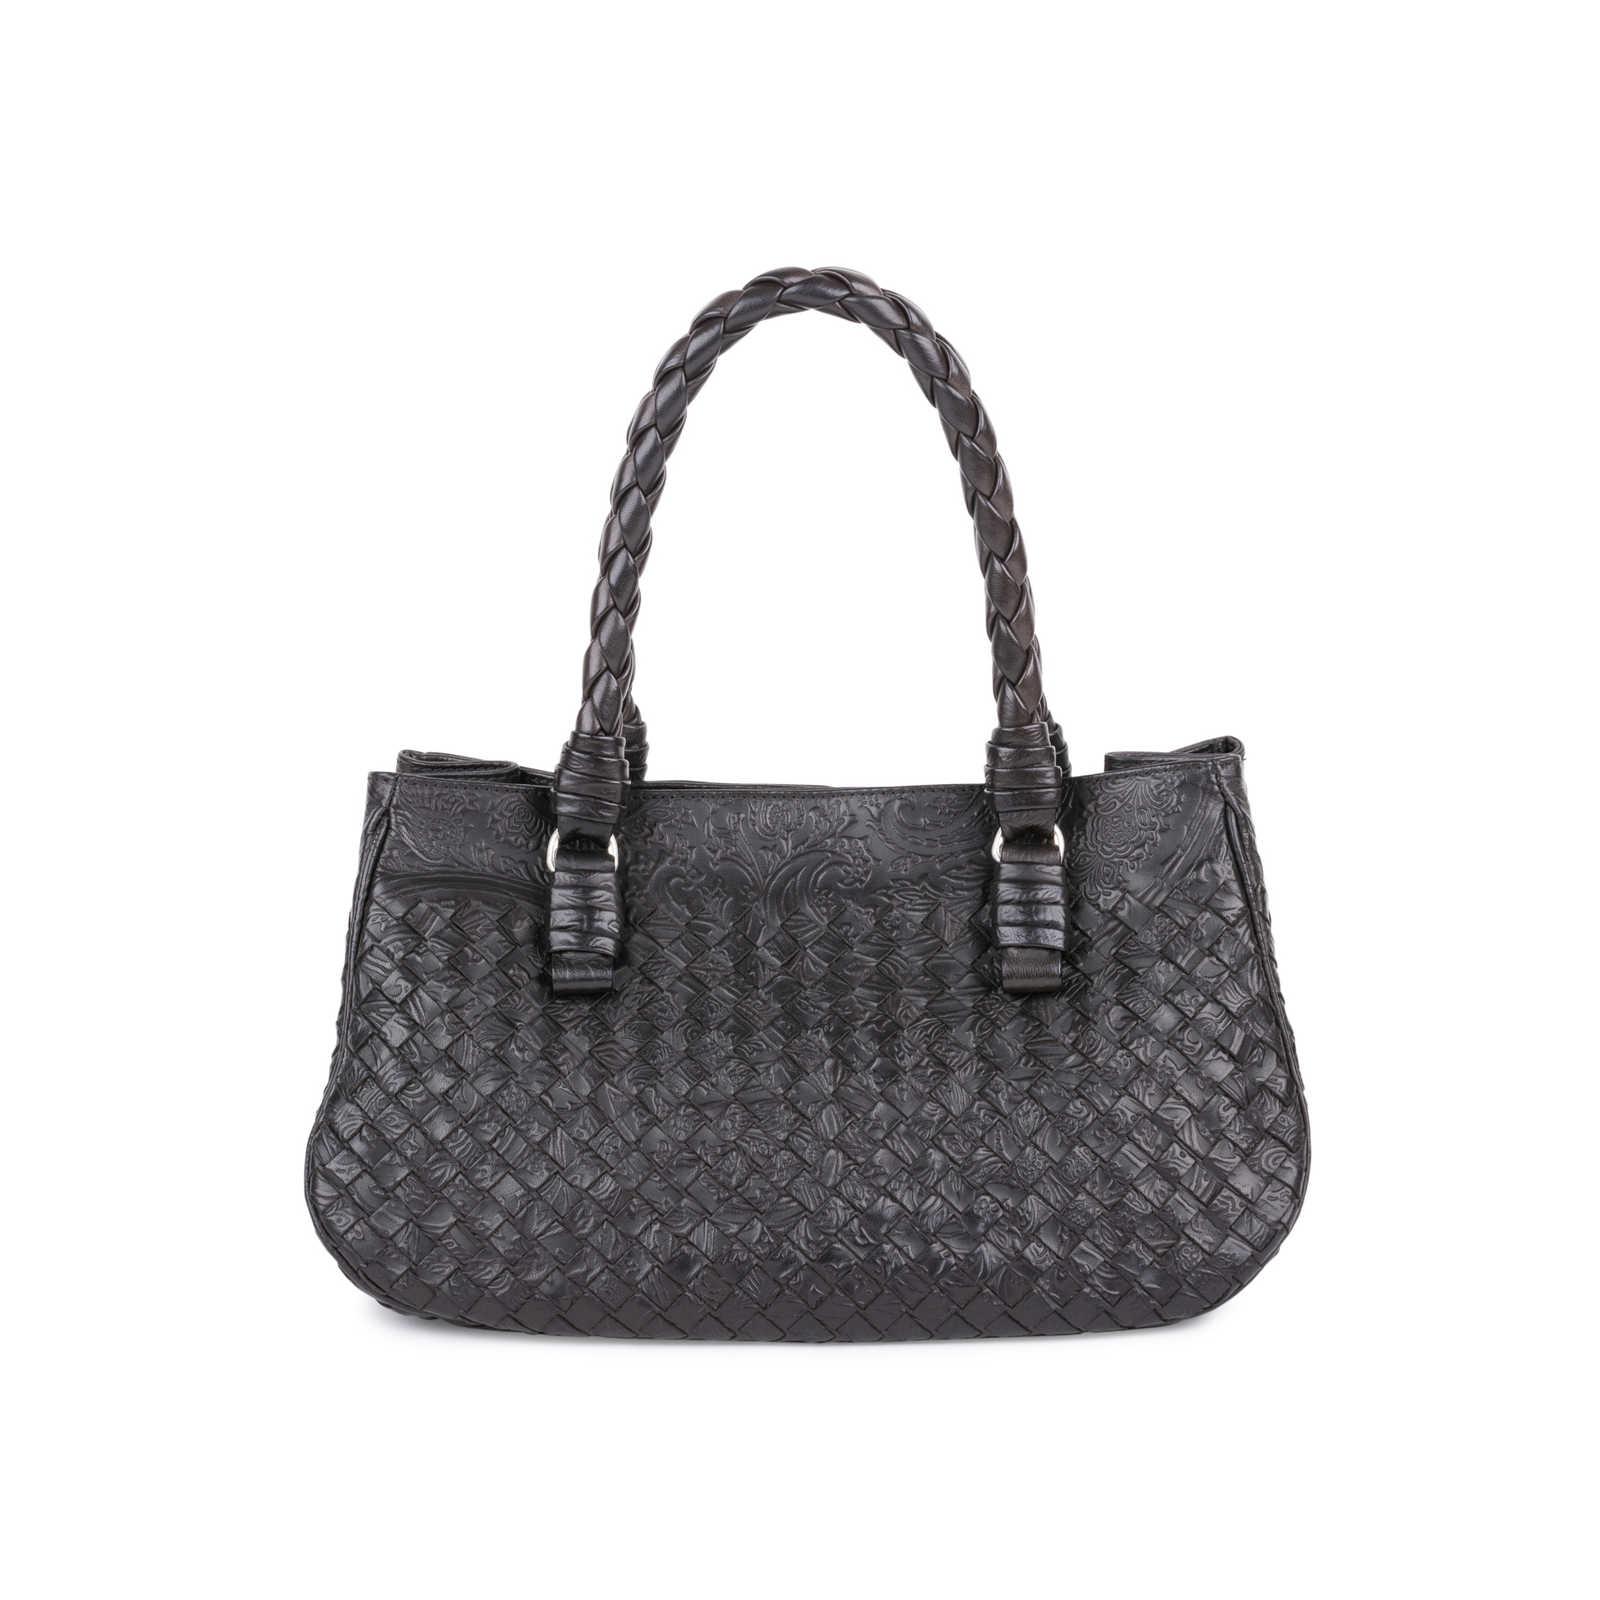 14c3cd7056e Authentic Pre Owned Bottega Veneta Embossed Intrecciato Leather Tote Bag  (PSS-594-00003 ...